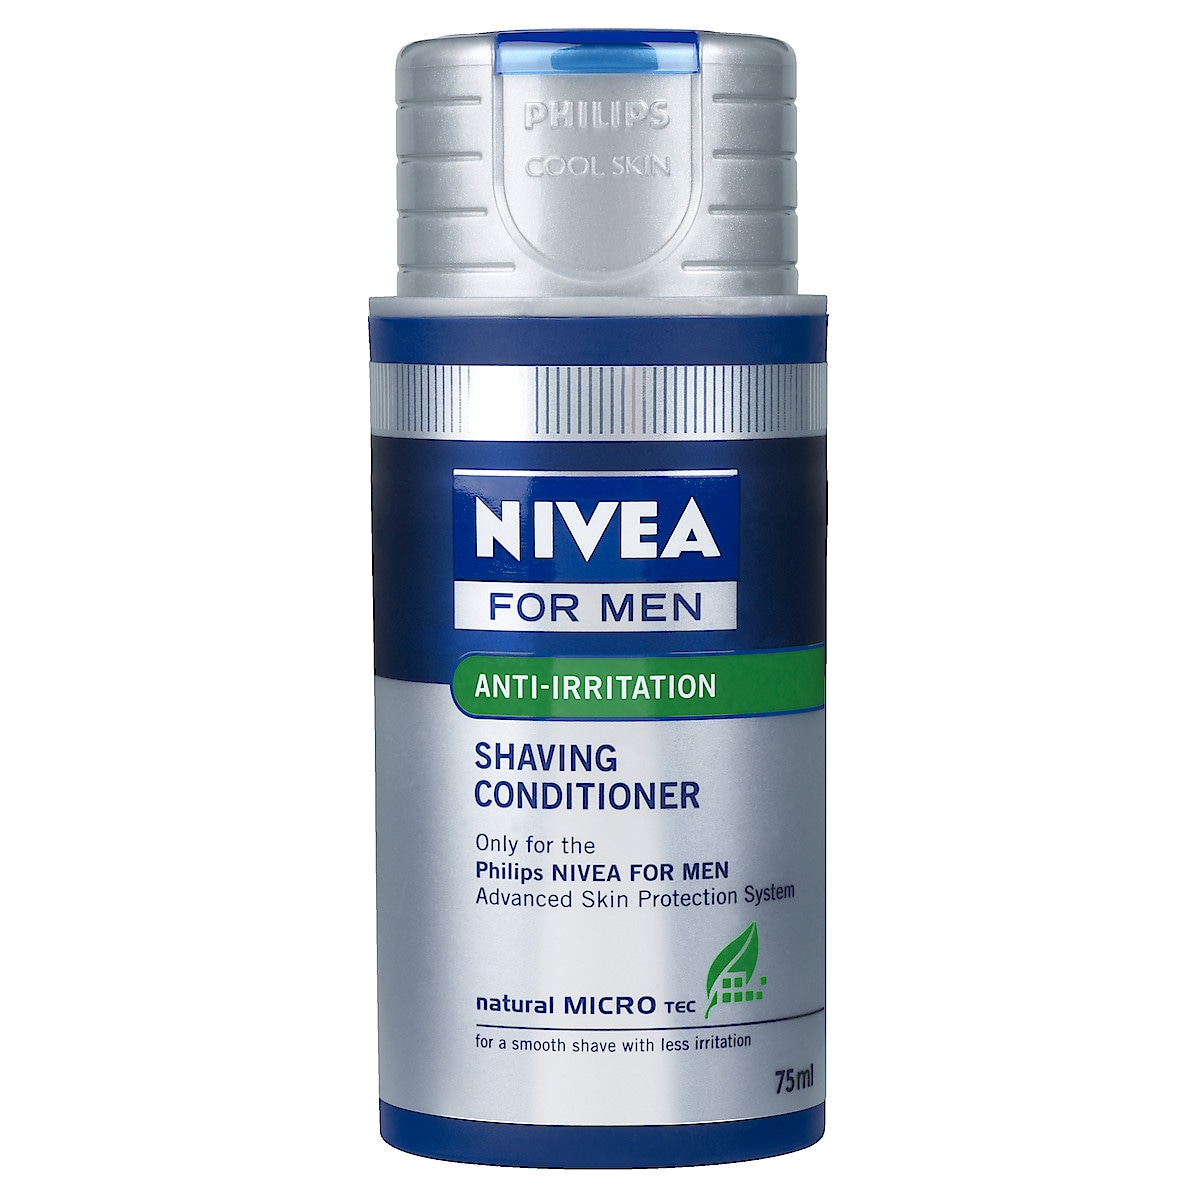 Nivea for Men Shaving Conditioner